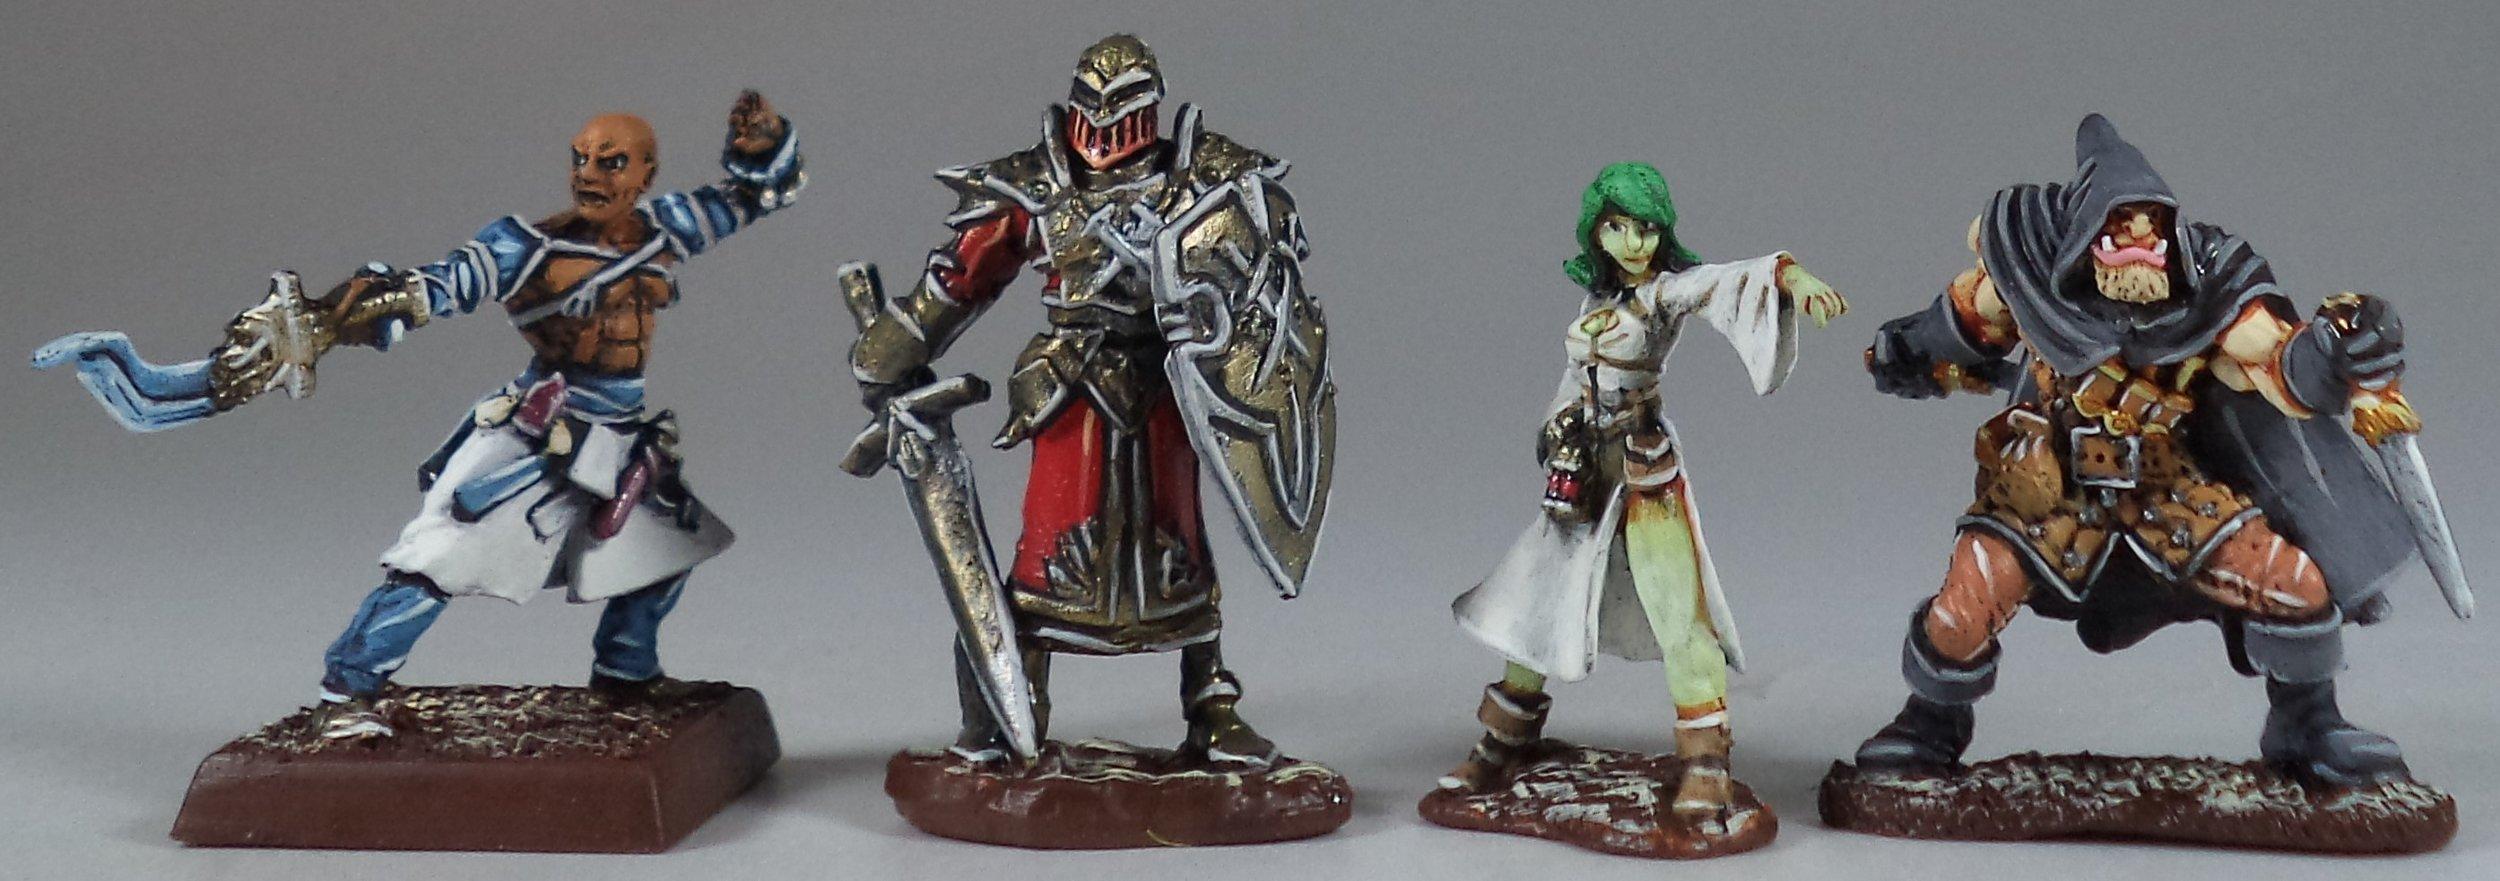 Reaper Miniatures (2).JPG